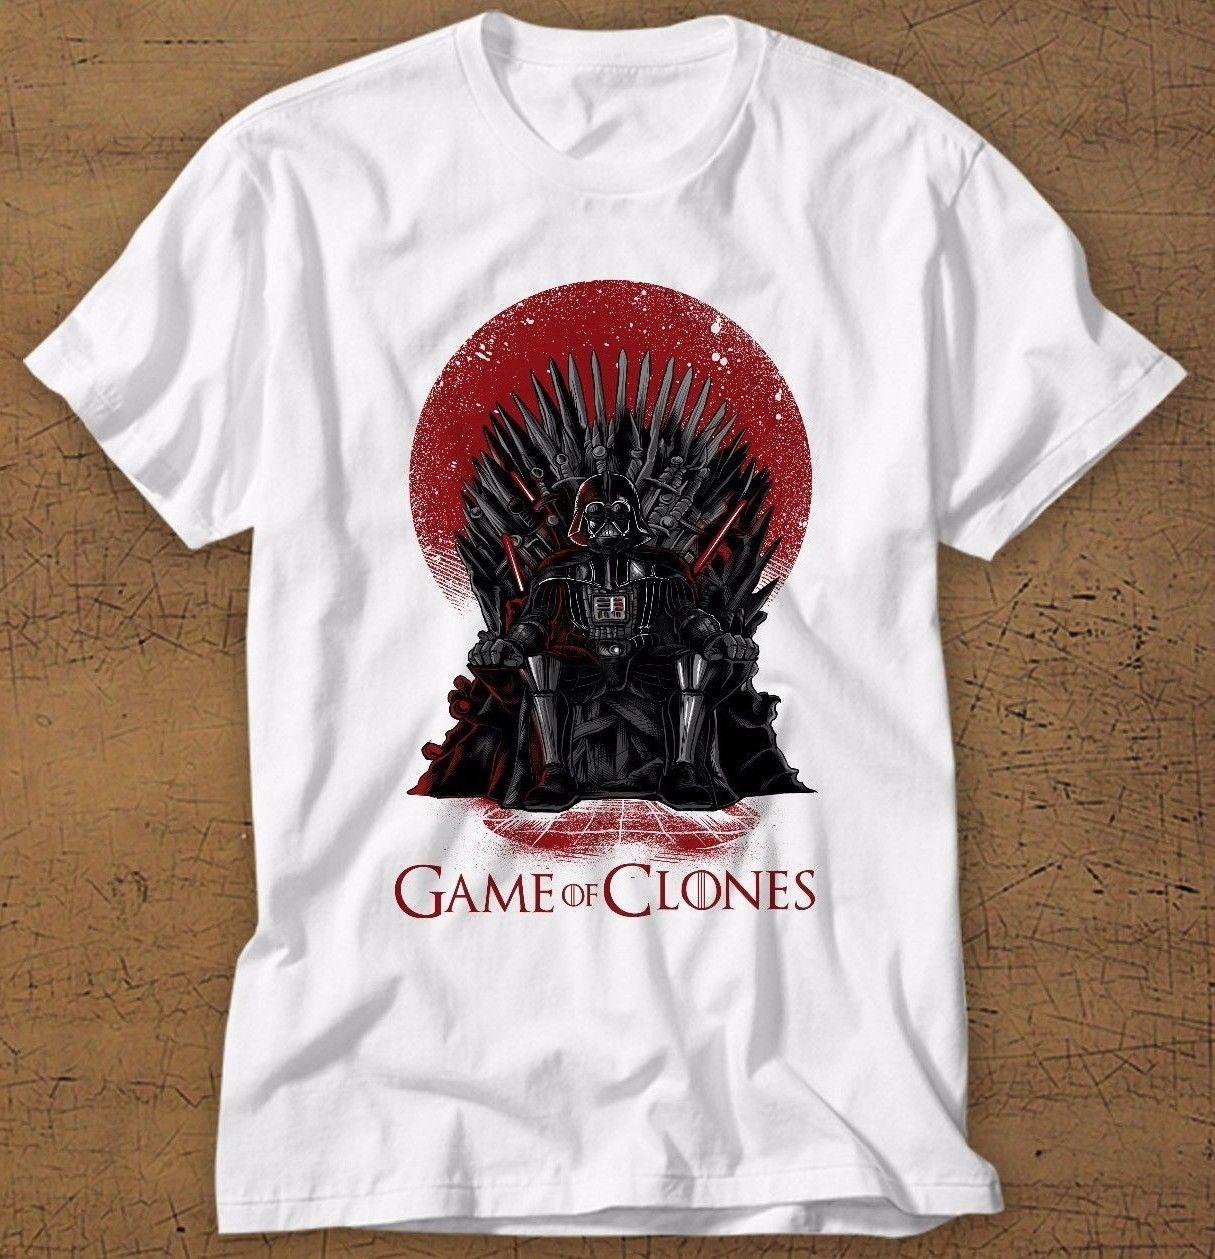 T shirt Short Sleeve Tops Darth Vader T-Shirt, Star Wars, Game Of Thrones, Funny Shirt,